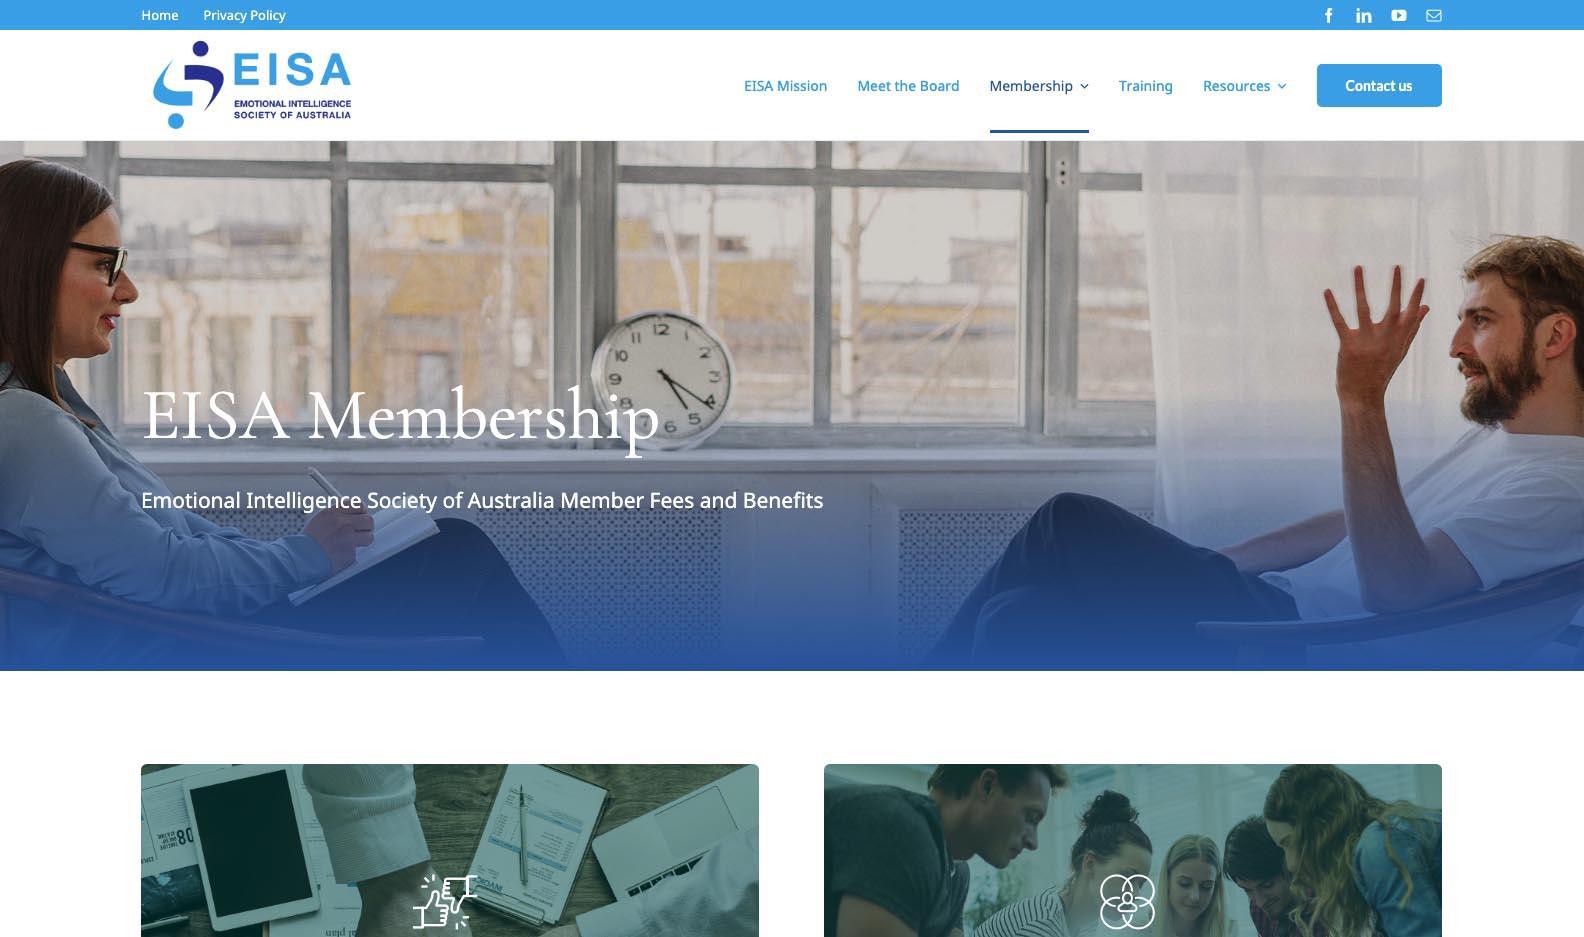 EISA Project type: Website design and development